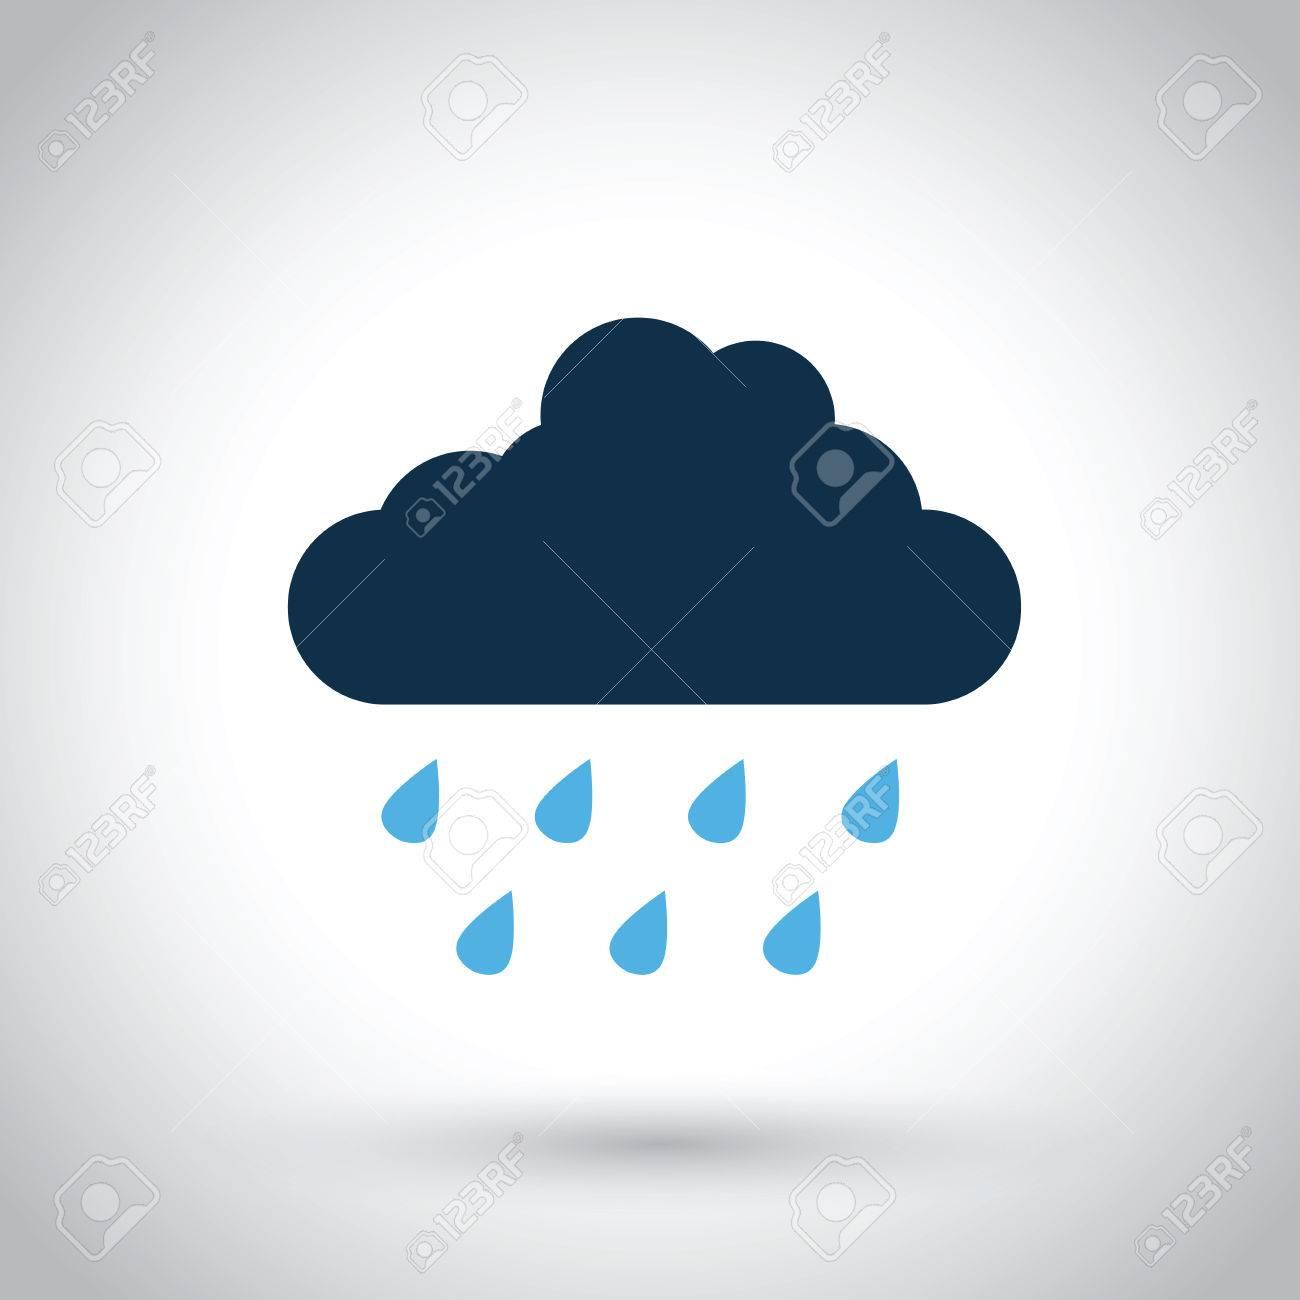 rain cloud - 63439517